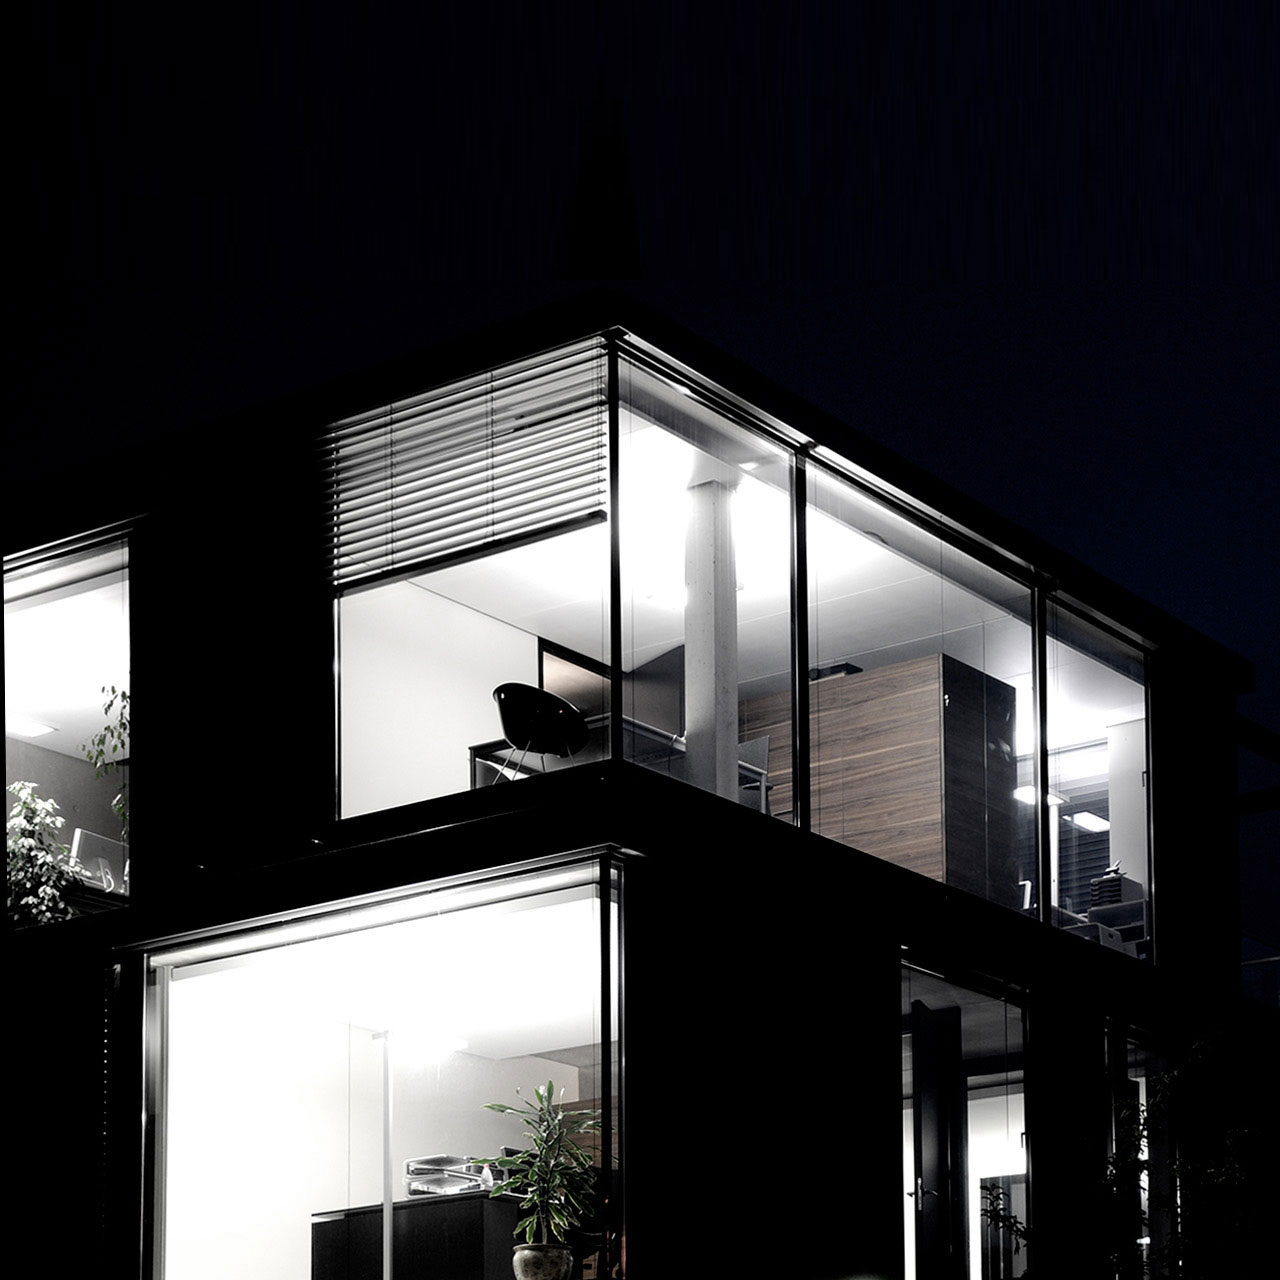 Neubau Bürogebäude Leinfelden-Echterdingen, Aussen Nachtaufnahme